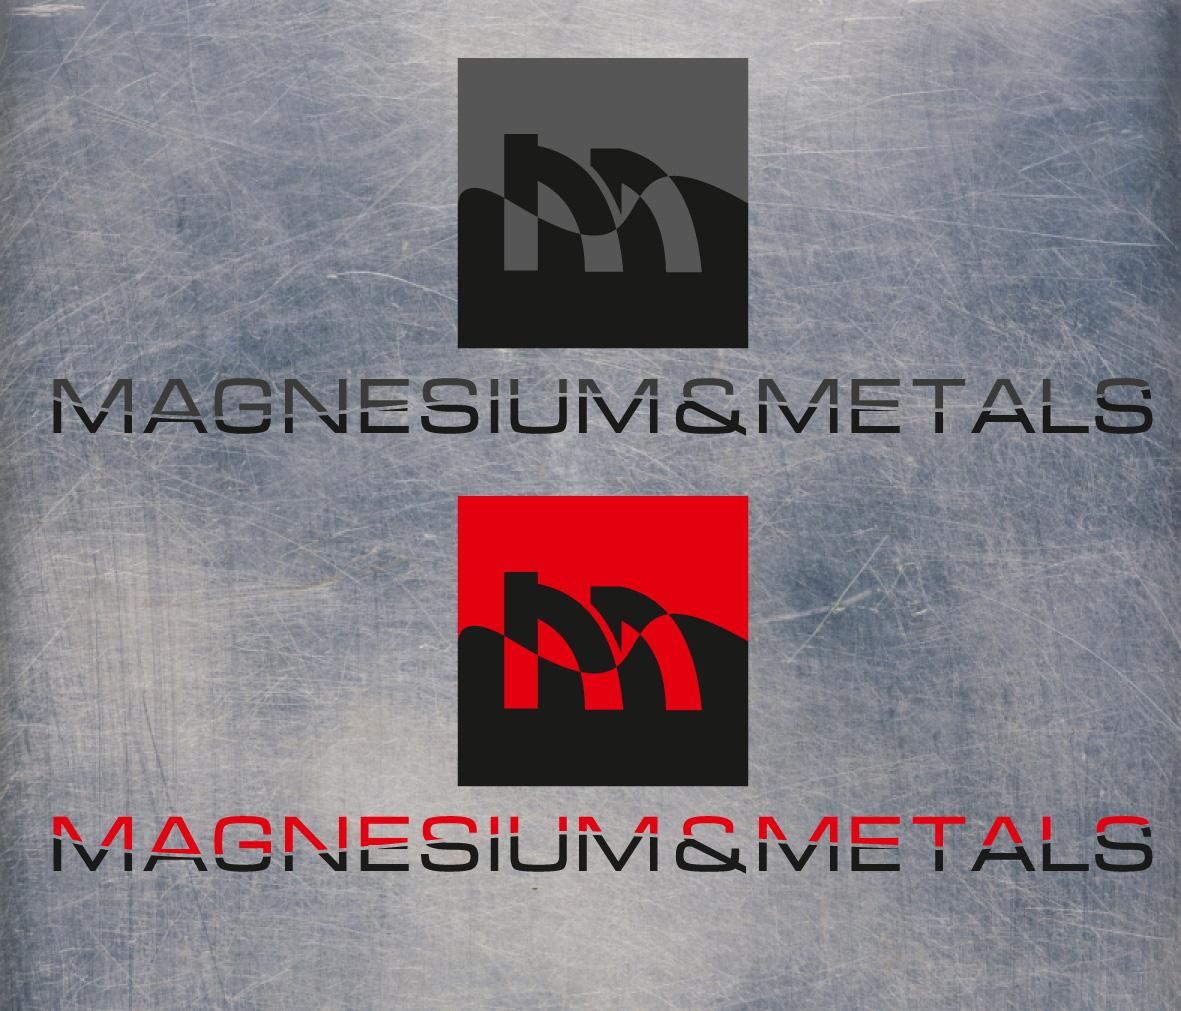 Логотип для проекта Magnesium&Metals фото f_4e92ddade6c40.jpg